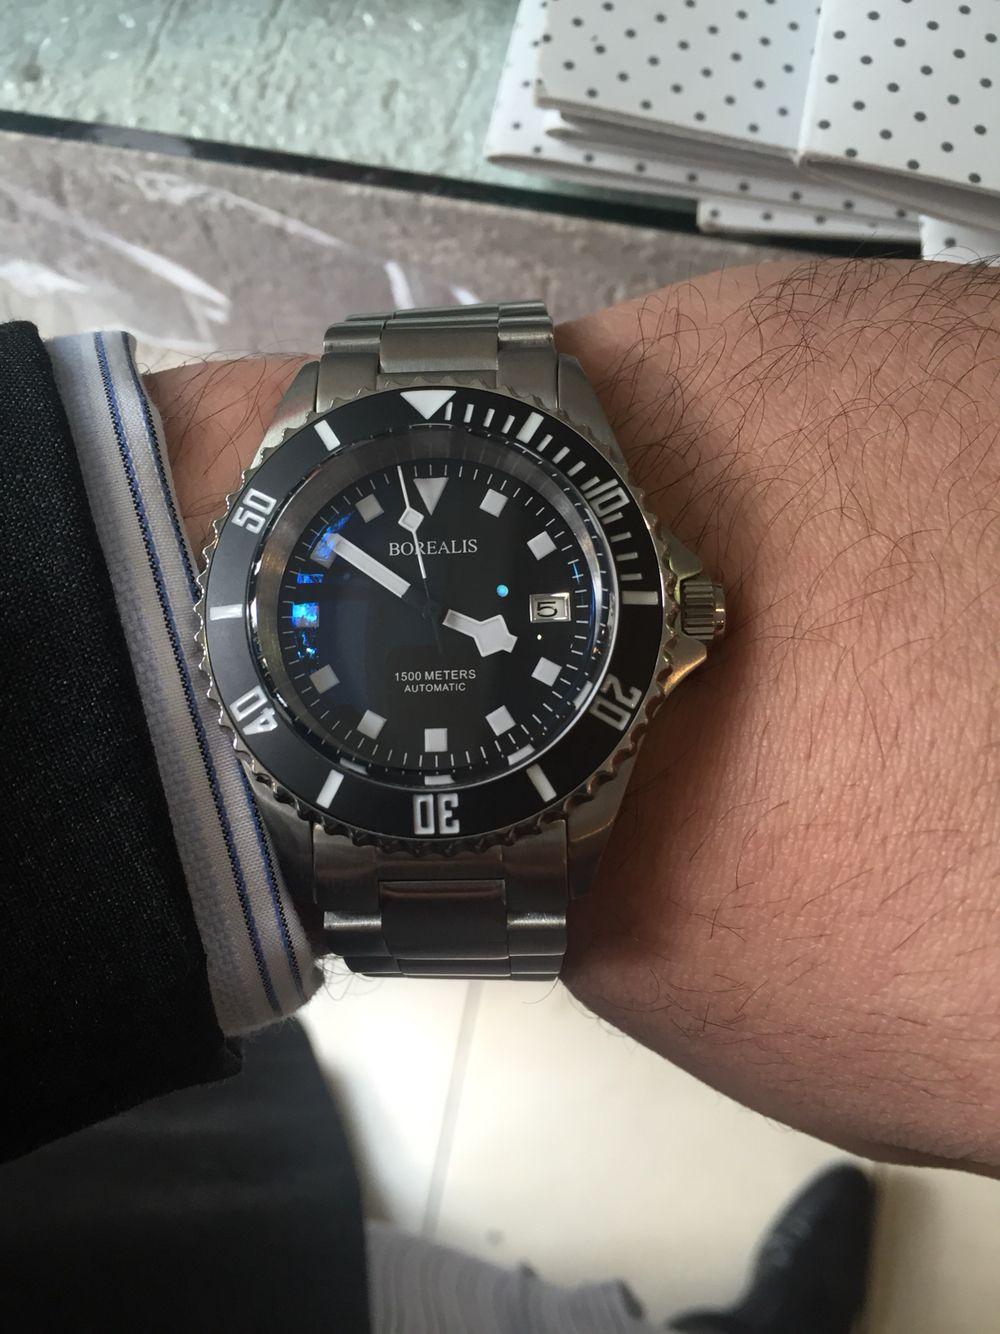 Reloj Borealisborealiswatch1500mtsRelojes WatchesSmart Borealisborealiswatch1500mtsRelojes Reloj Borealisborealiswatch1500mtsRelojes Reloj WatchesSmart WatchesSmart Reloj Reloj WatchesSmart WatchesSmart Reloj Borealisborealiswatch1500mtsRelojes Borealisborealiswatch1500mtsRelojes Y76vbfyg